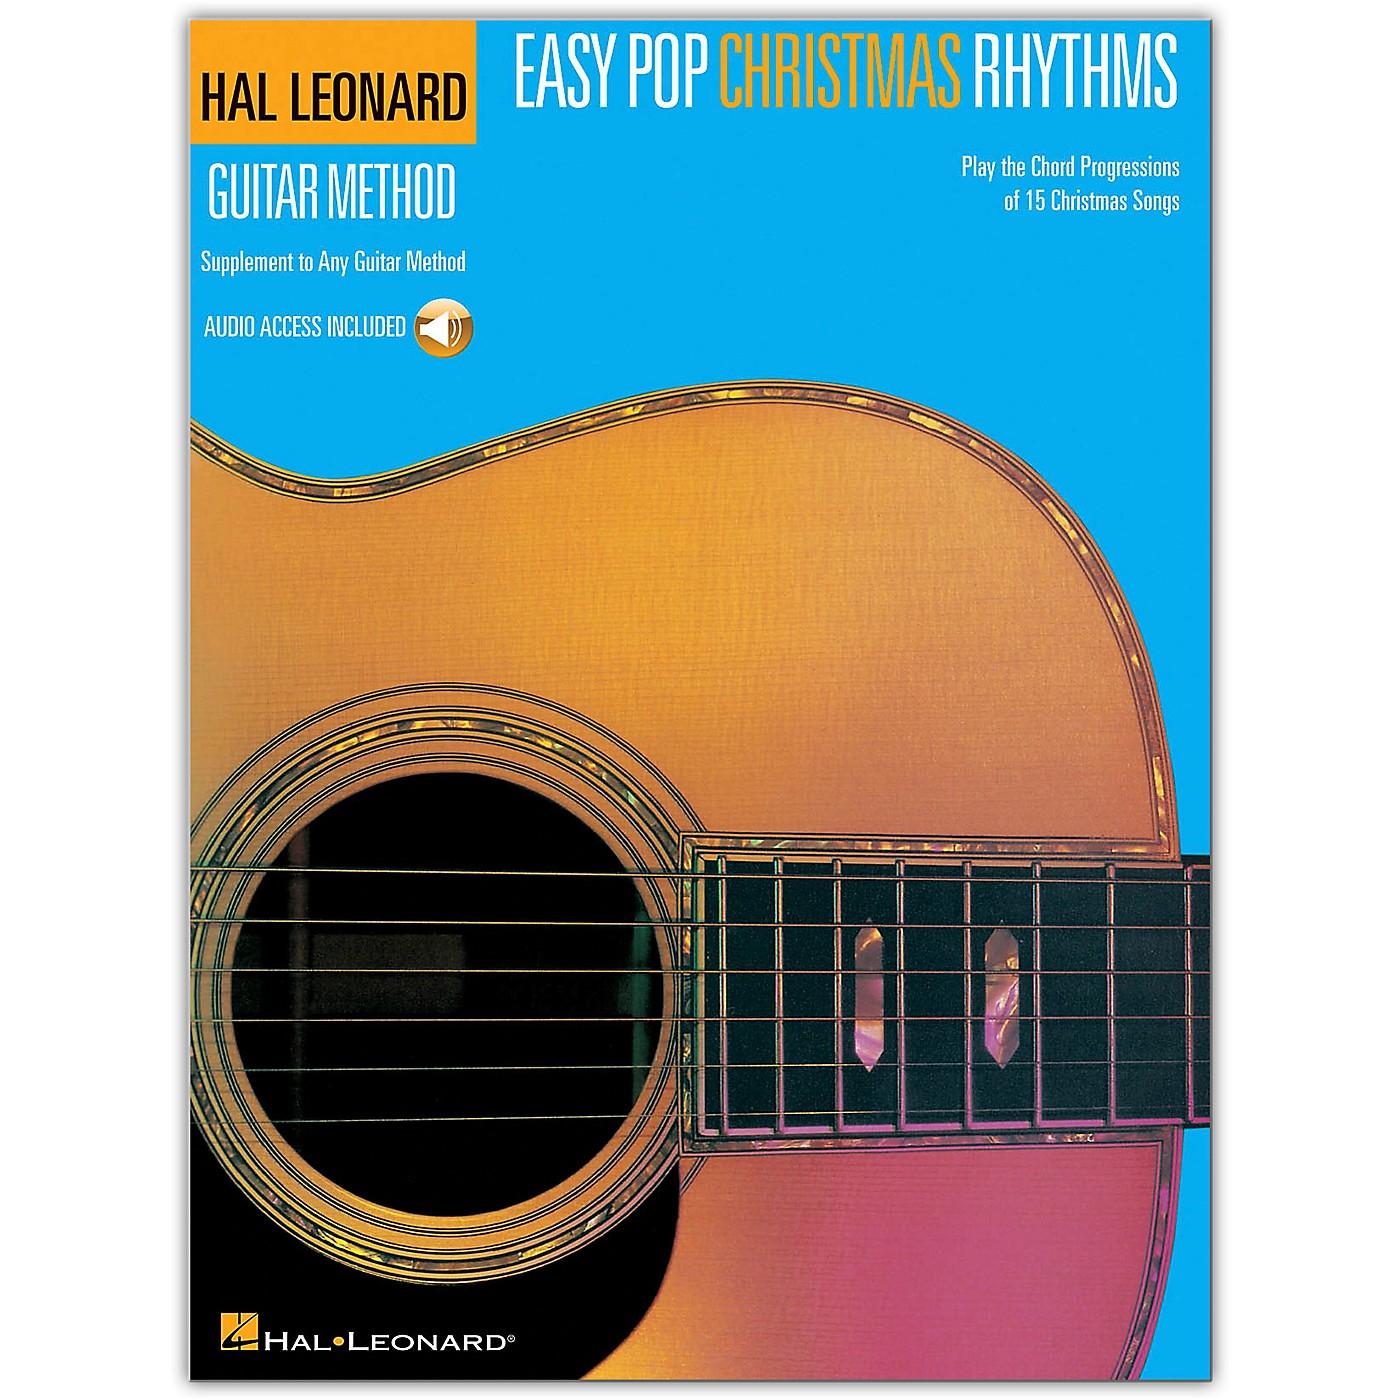 Hal Leonard Easy Pop Christmas Rhythms (Supplement to Any Guitar Method) Book/Audio Online thumbnail